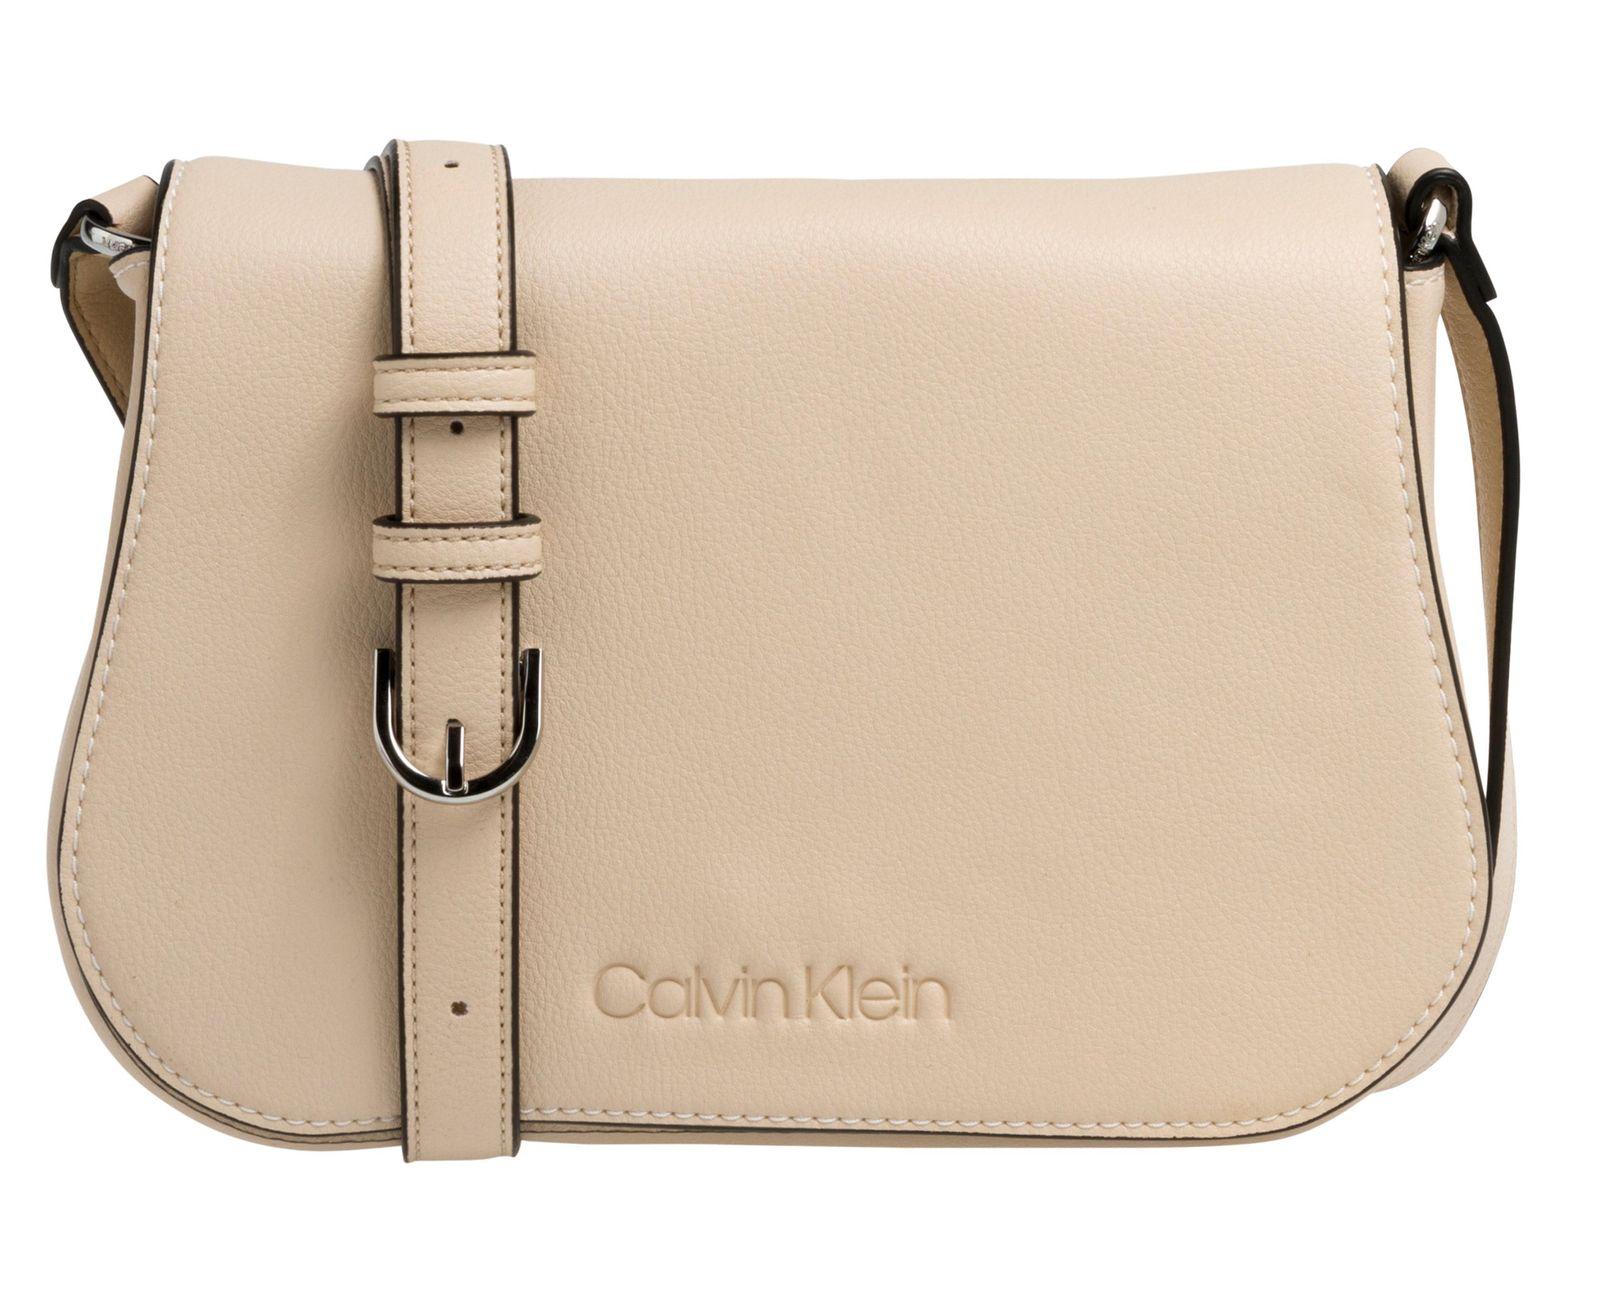 3b91a2f2317f0 Calvin Klein Slide Saddle Bag Light Sand